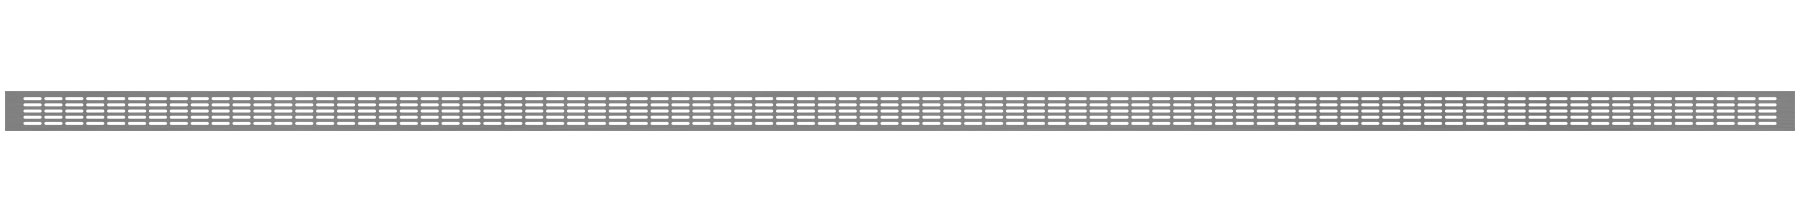 VRS-009 - Ventilaciona rešetka 66×2980 mm